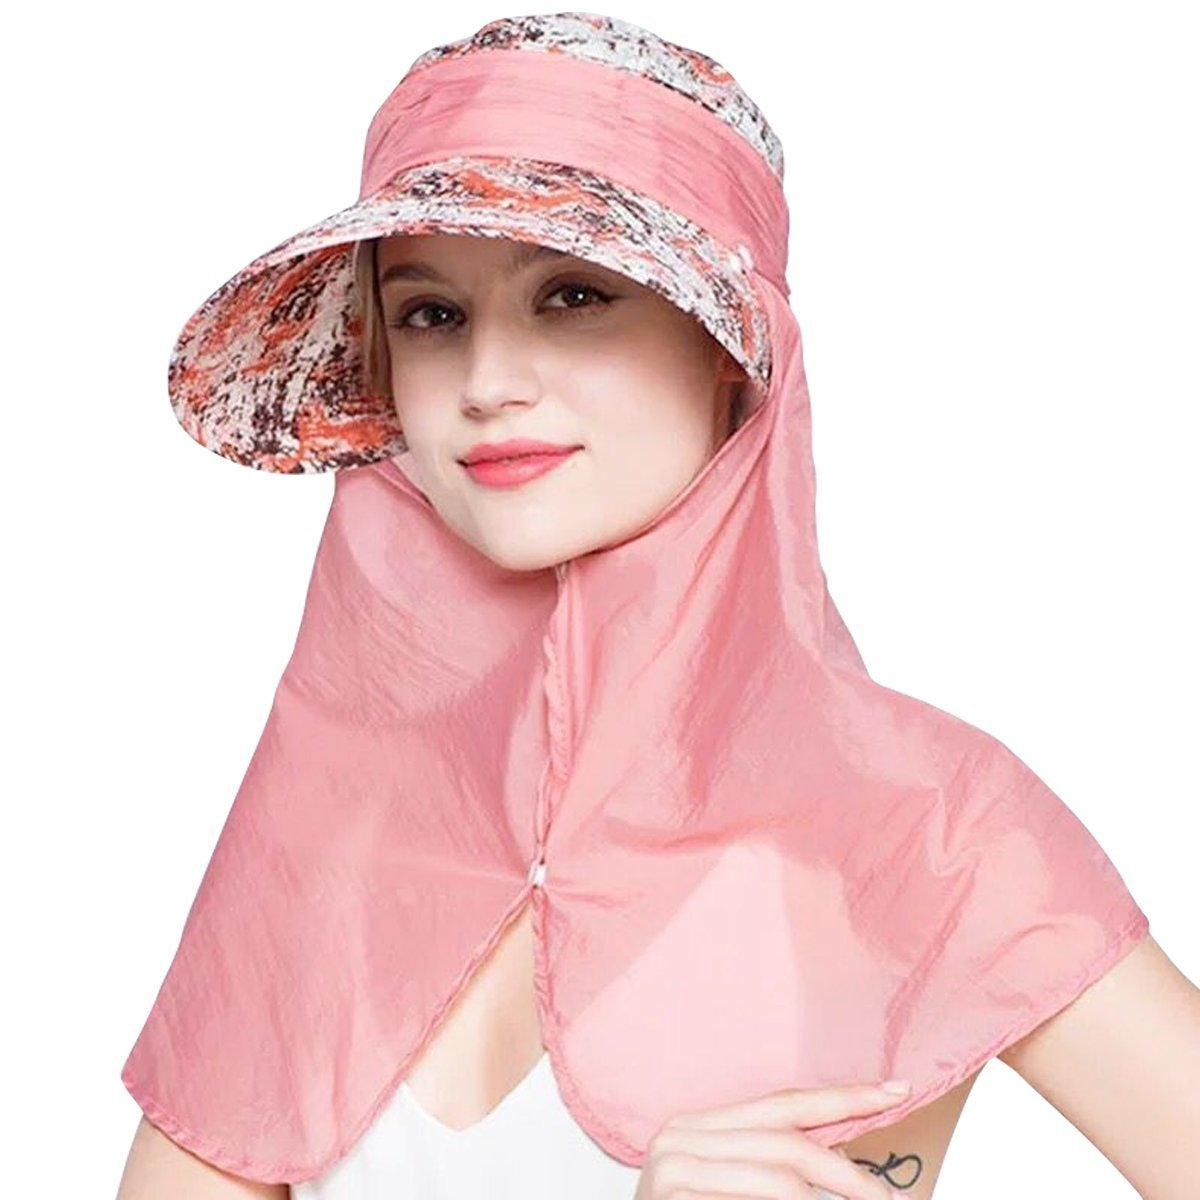 EINSKEY Womens Visor Hat with Neck Flap Summer 360° UV Protection Sun Hat hat-10